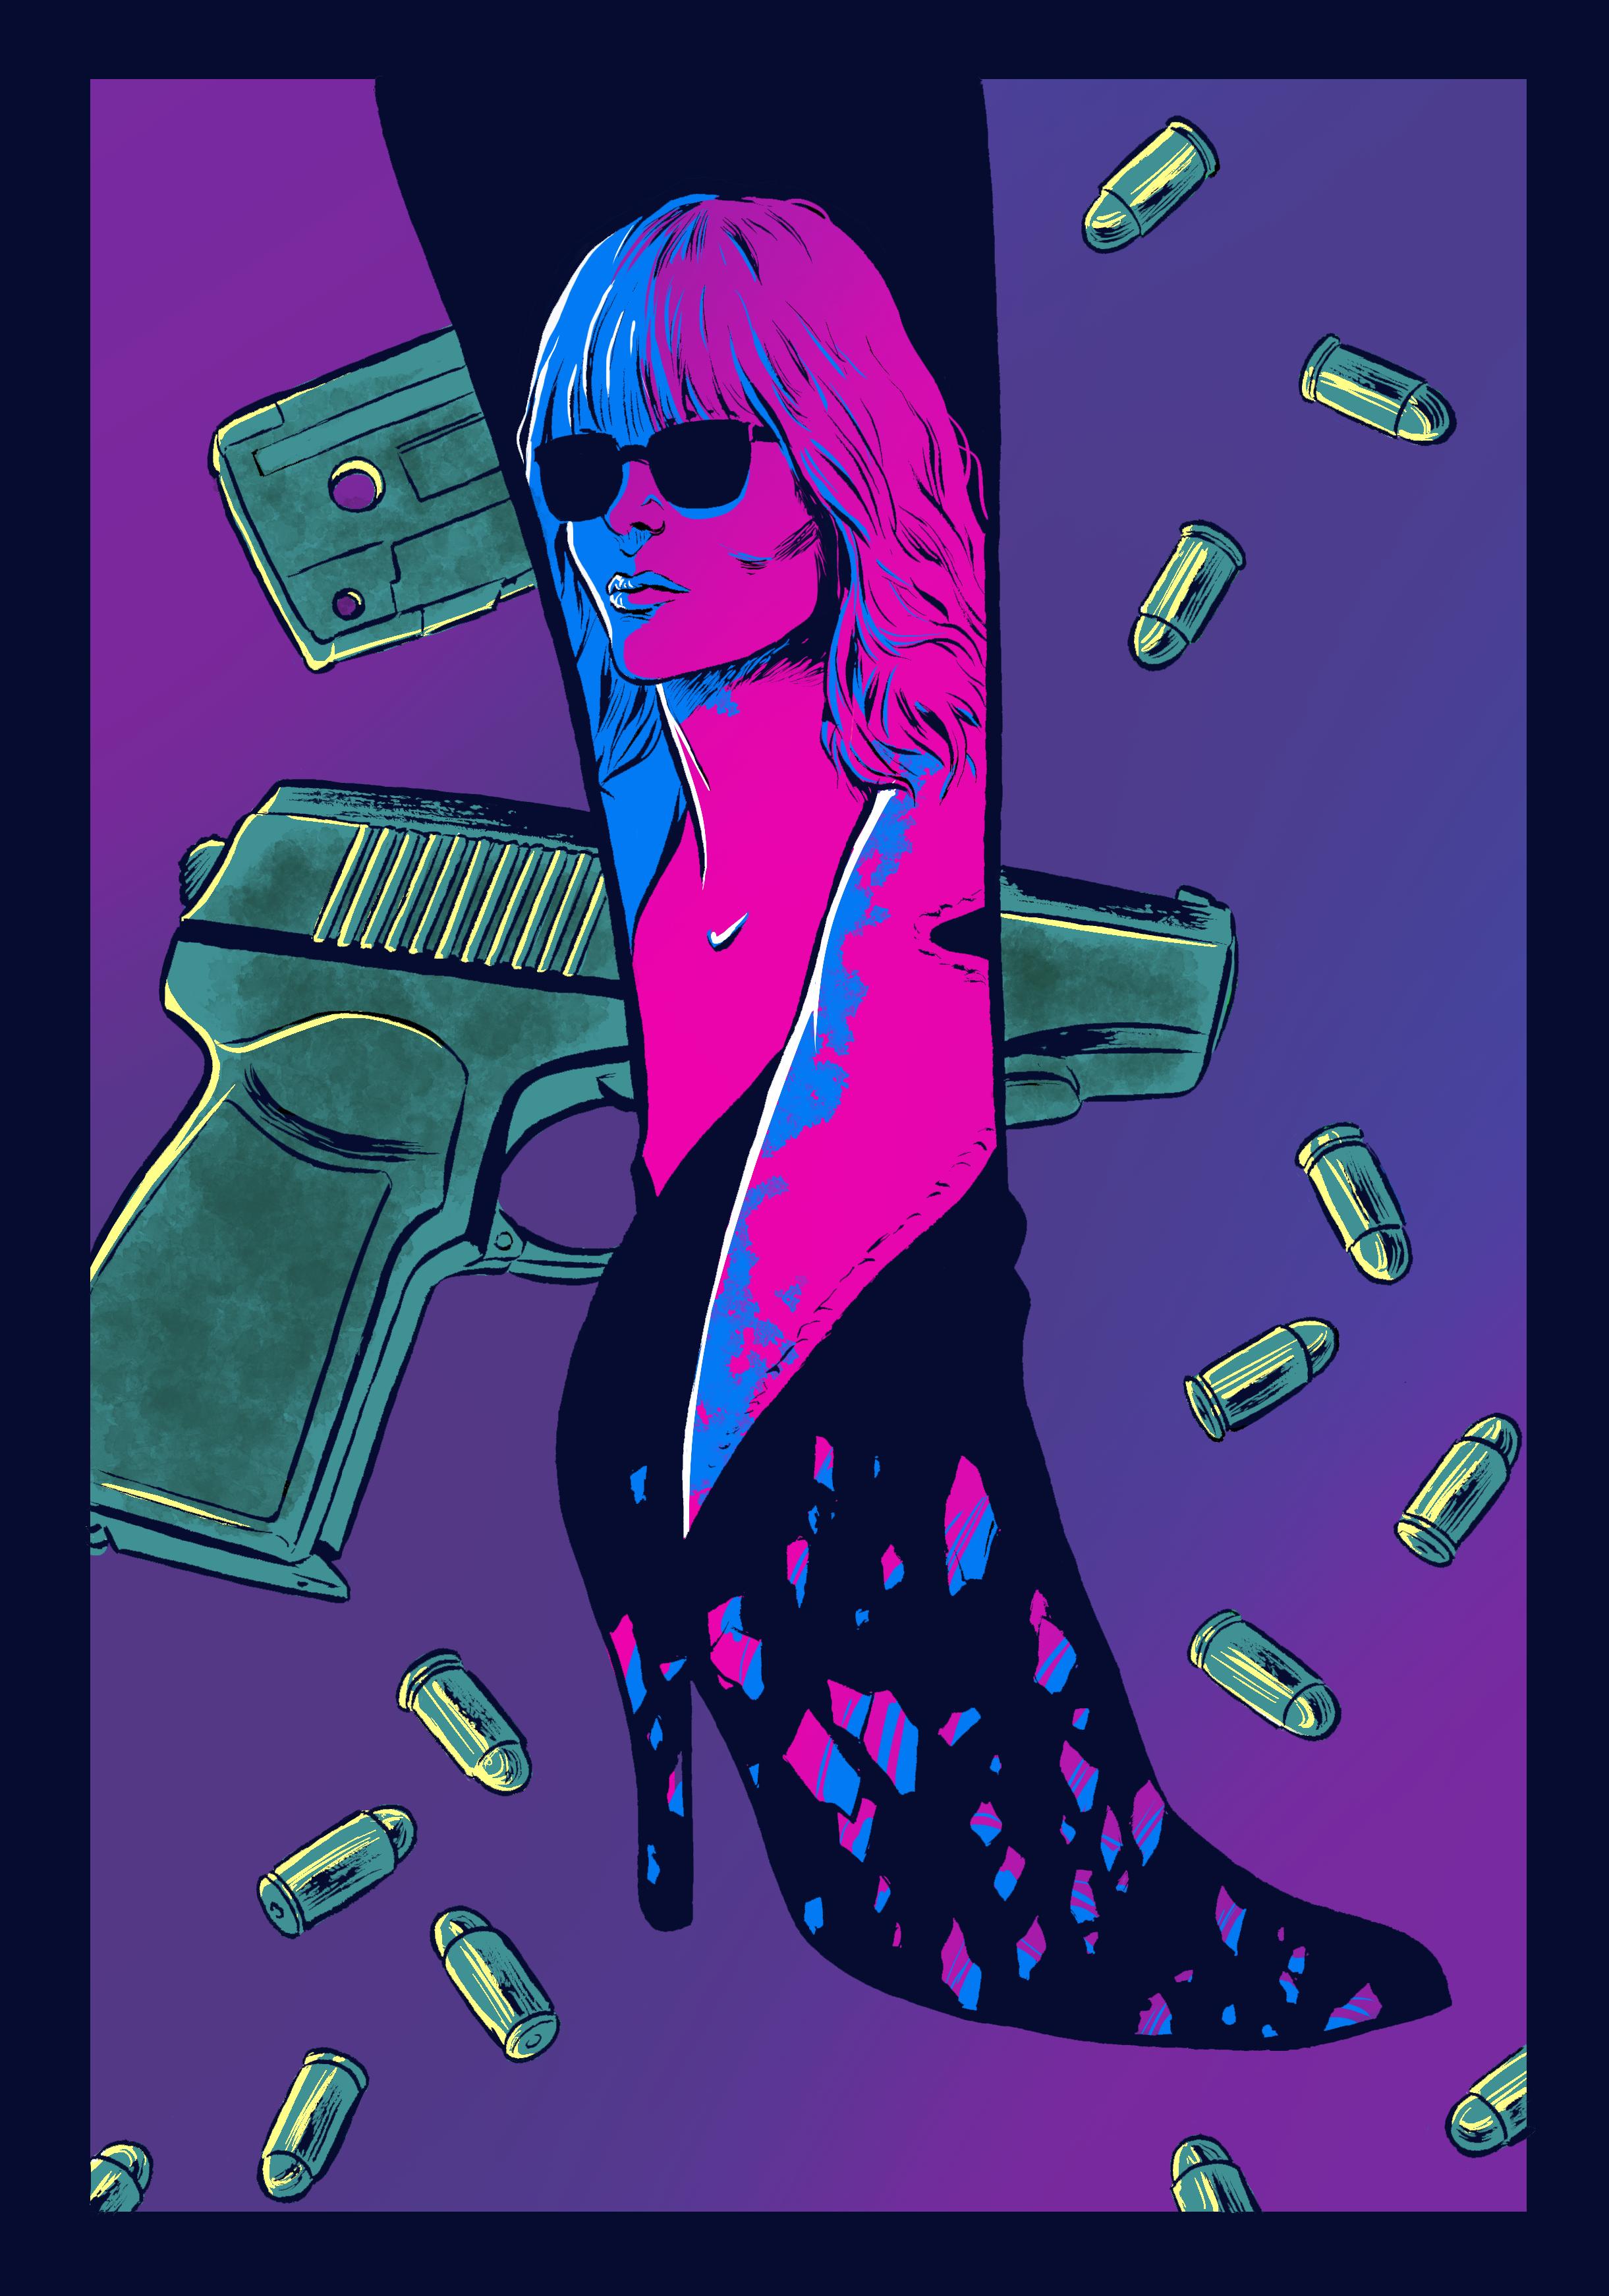 Atomic Blonde Fan Art by SERGIOTARQUINI